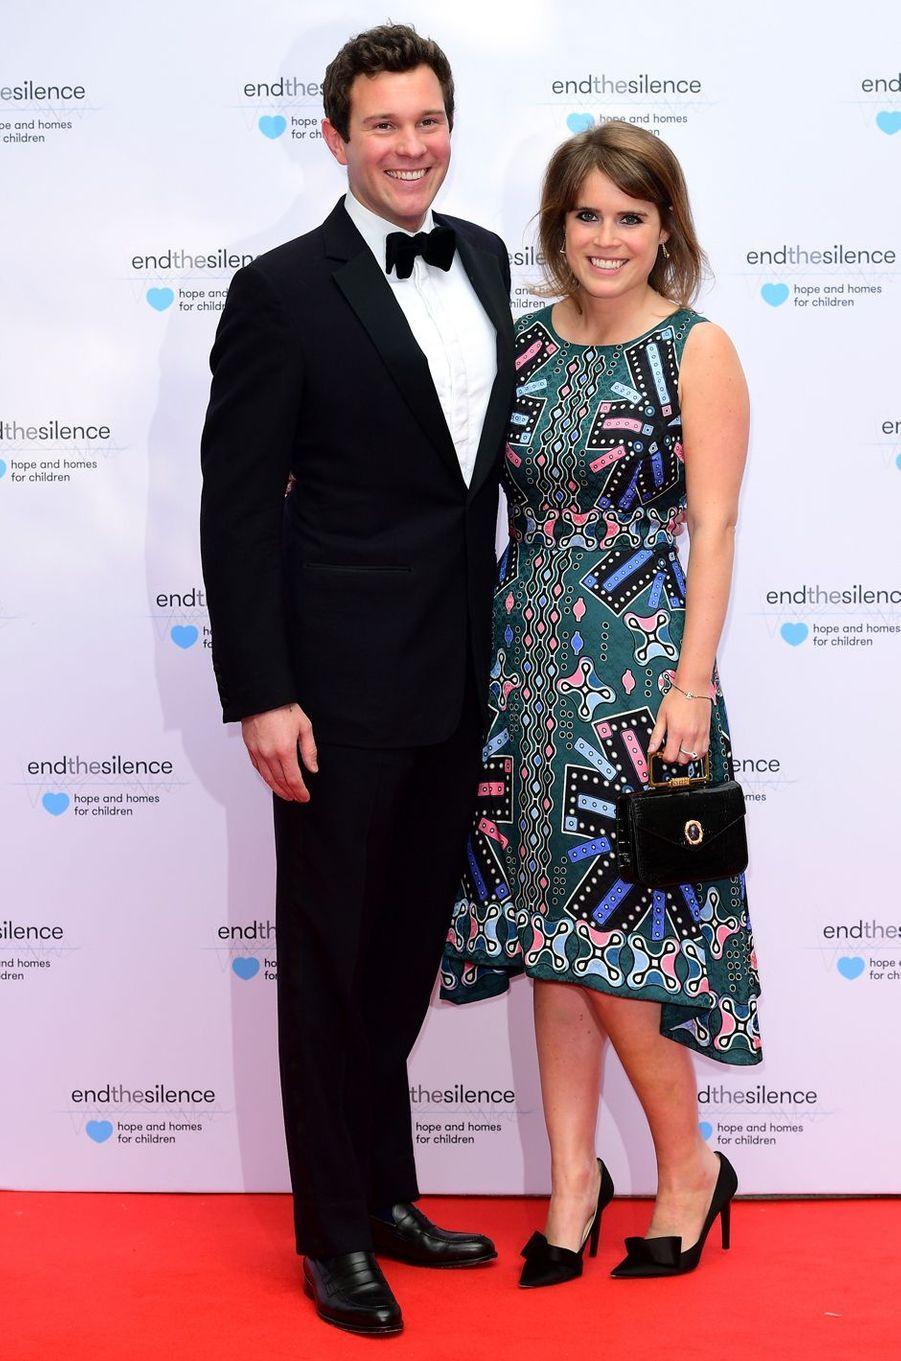 La princesse Eugenie d'York et Jack Brooksbank, le 31 mai 2017